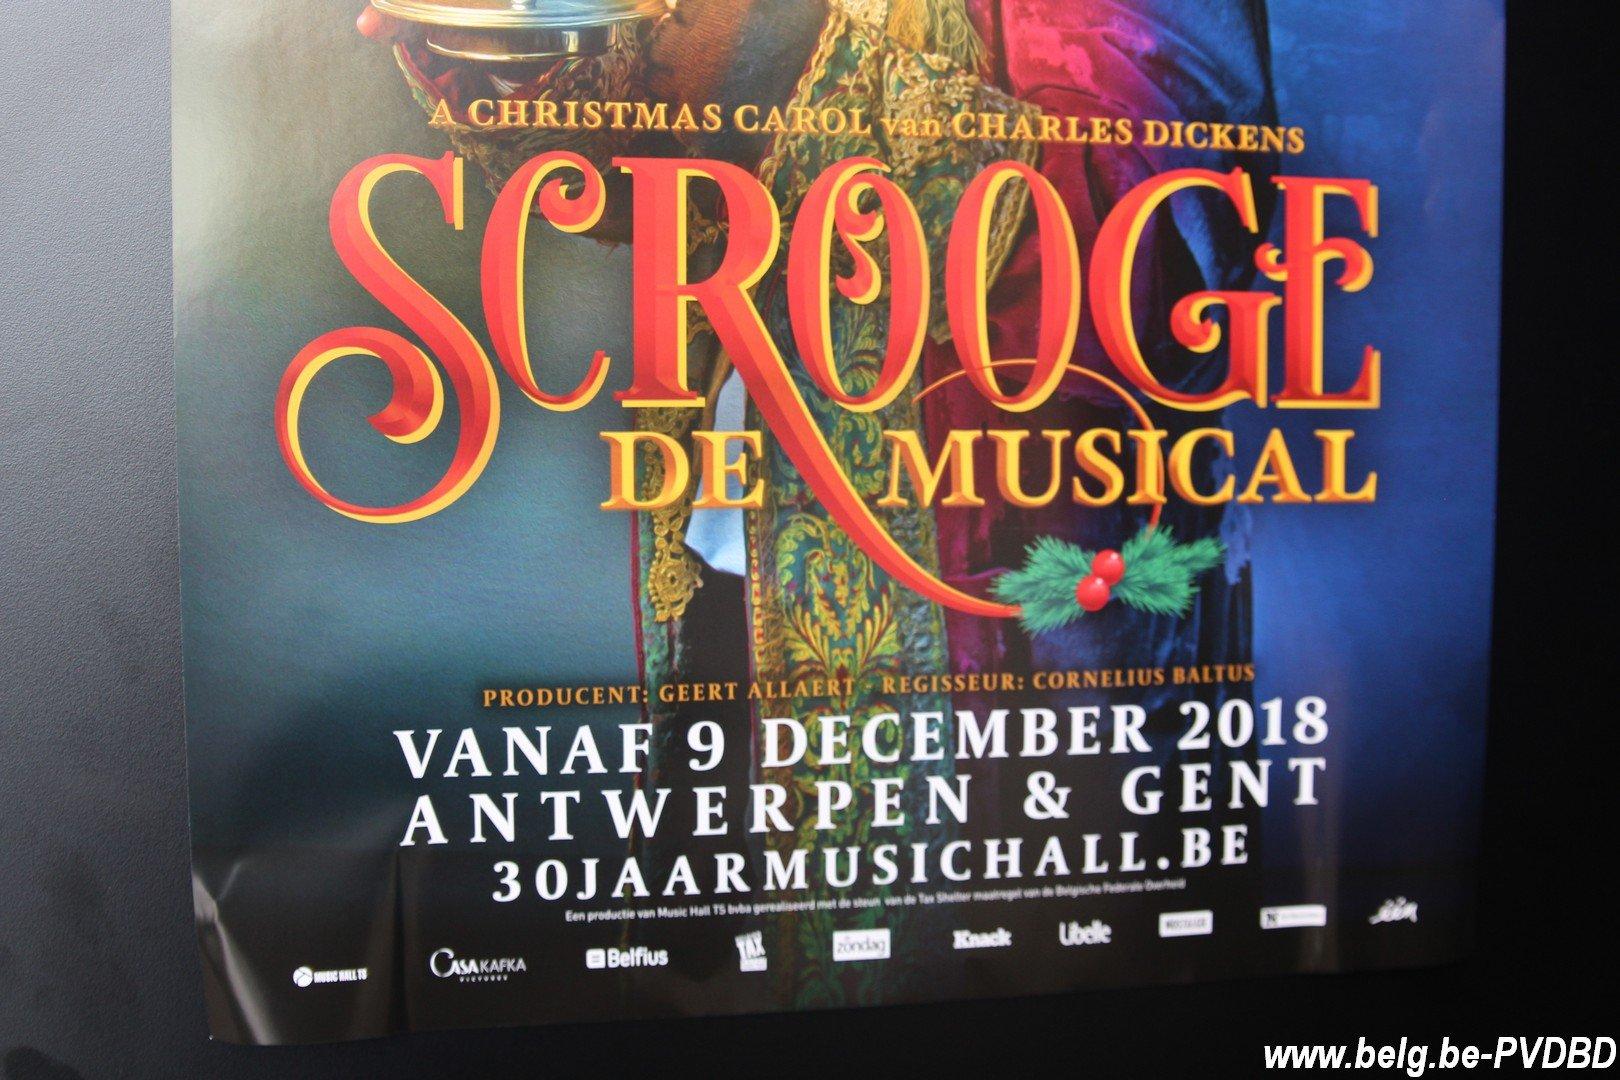 Music Hall voorziet nu al6 extra voorstellingenvan 'Scrooge - IMG 2438